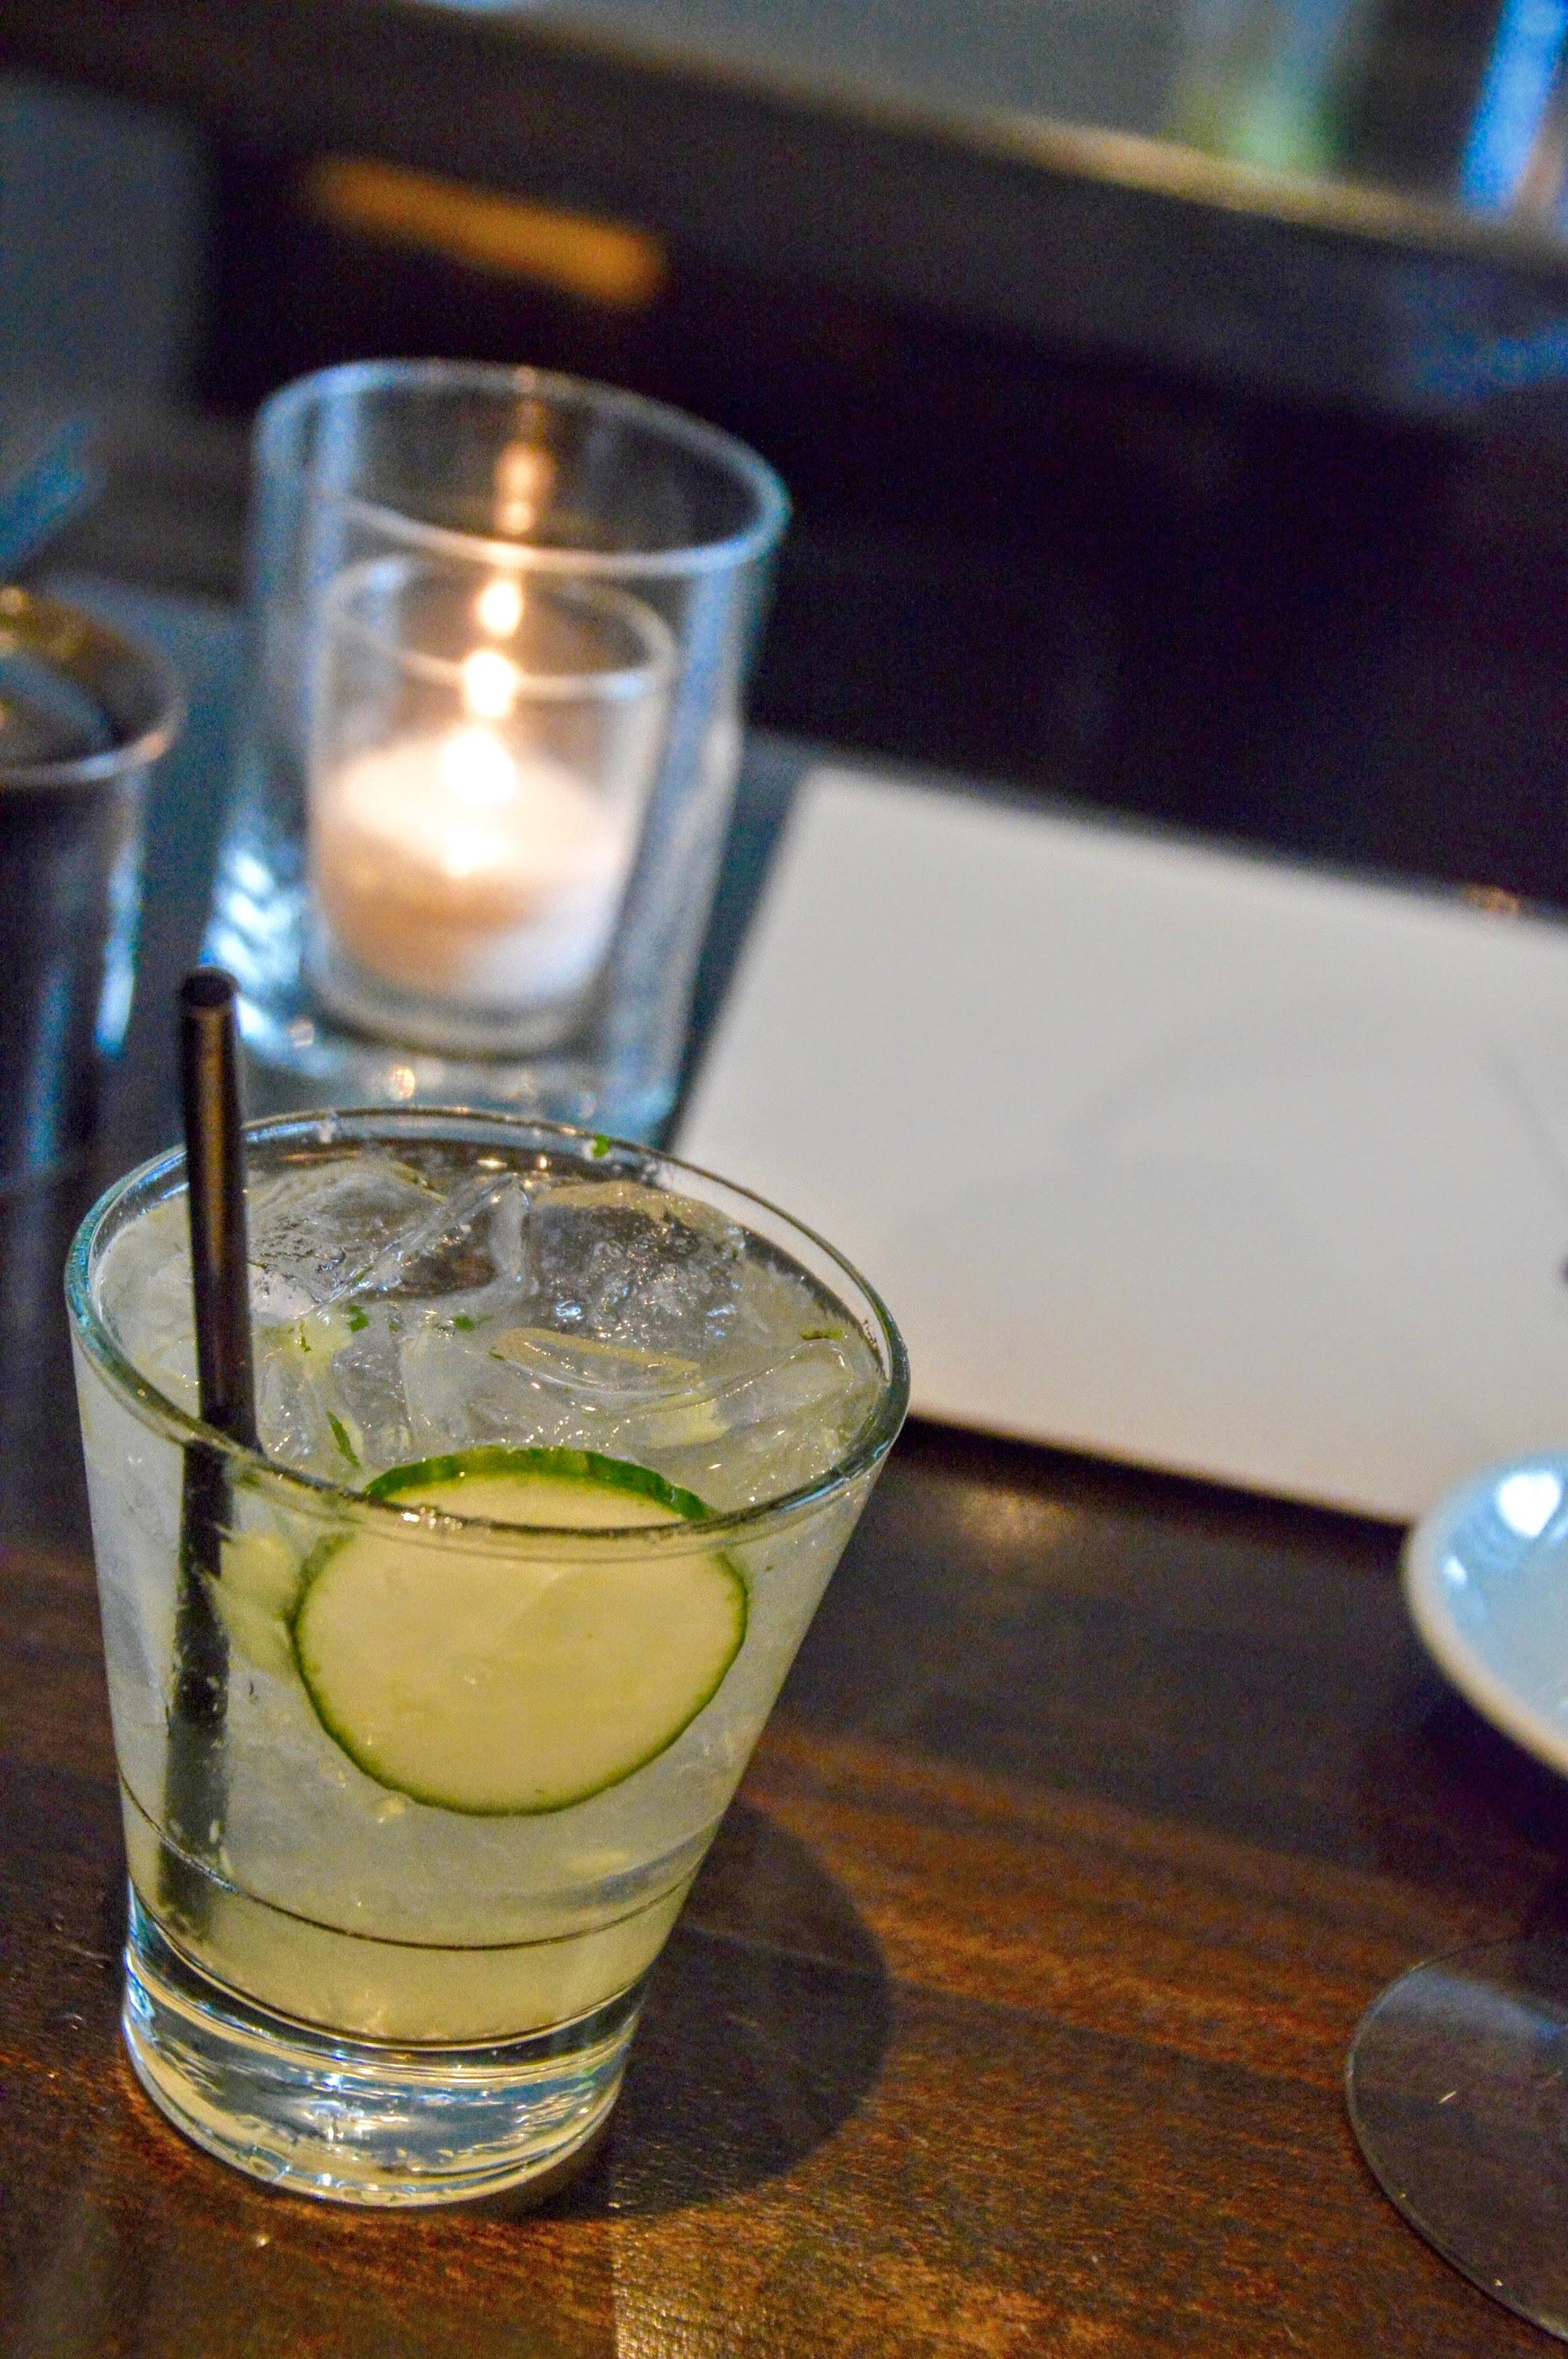 Rockin' Cucumber   - Sake, Vodka, Cucumber, Mint, Yuzu